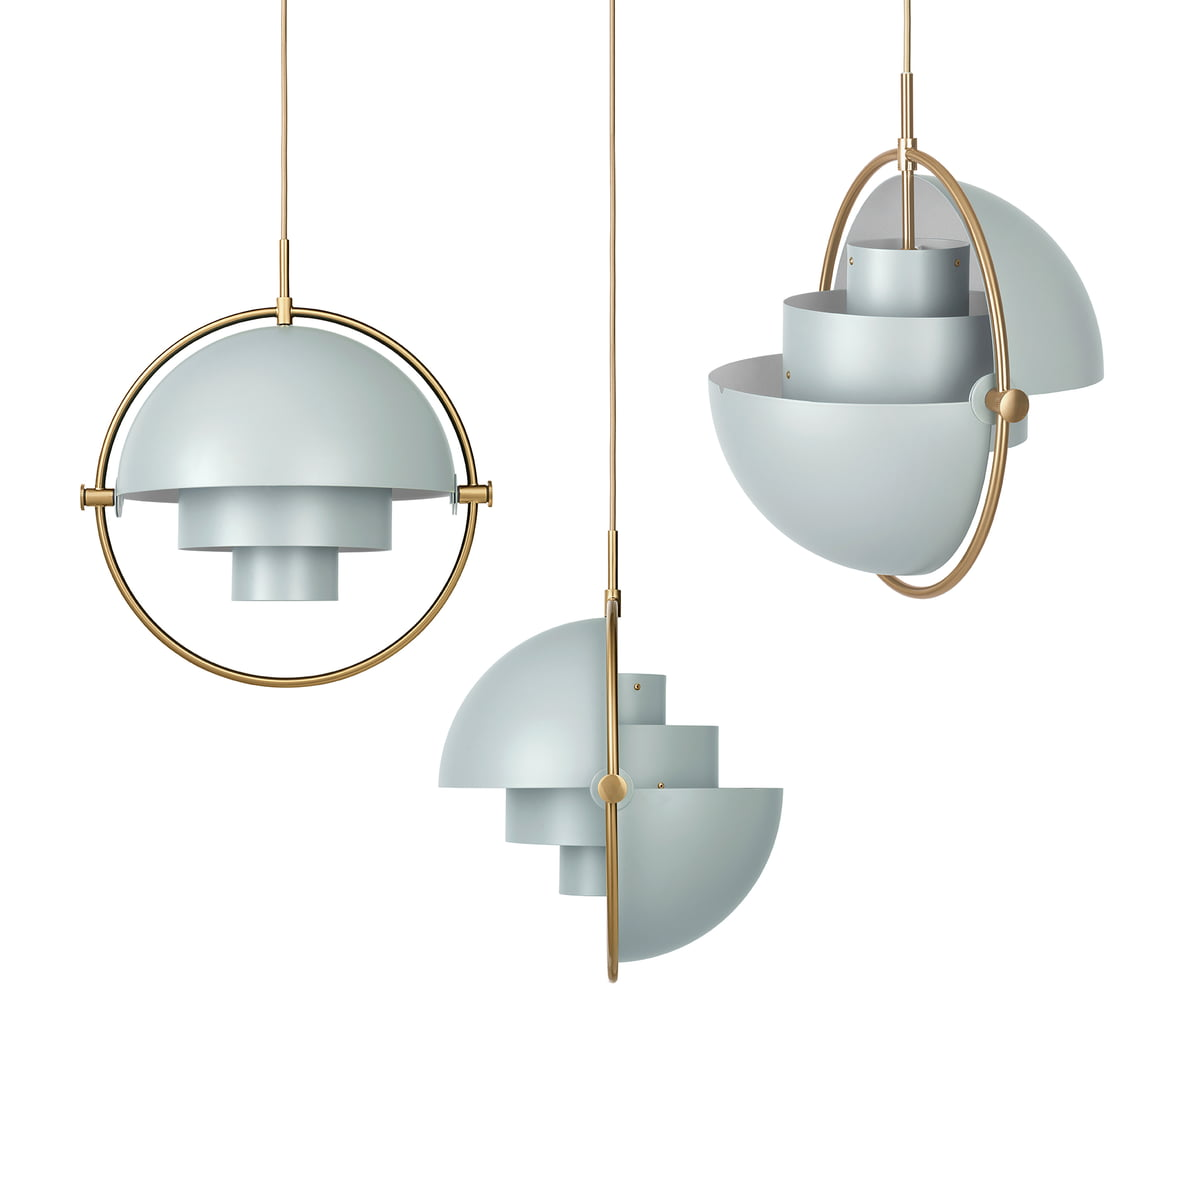 Multi-Lite Pendant Lamp by Gubi | Connox